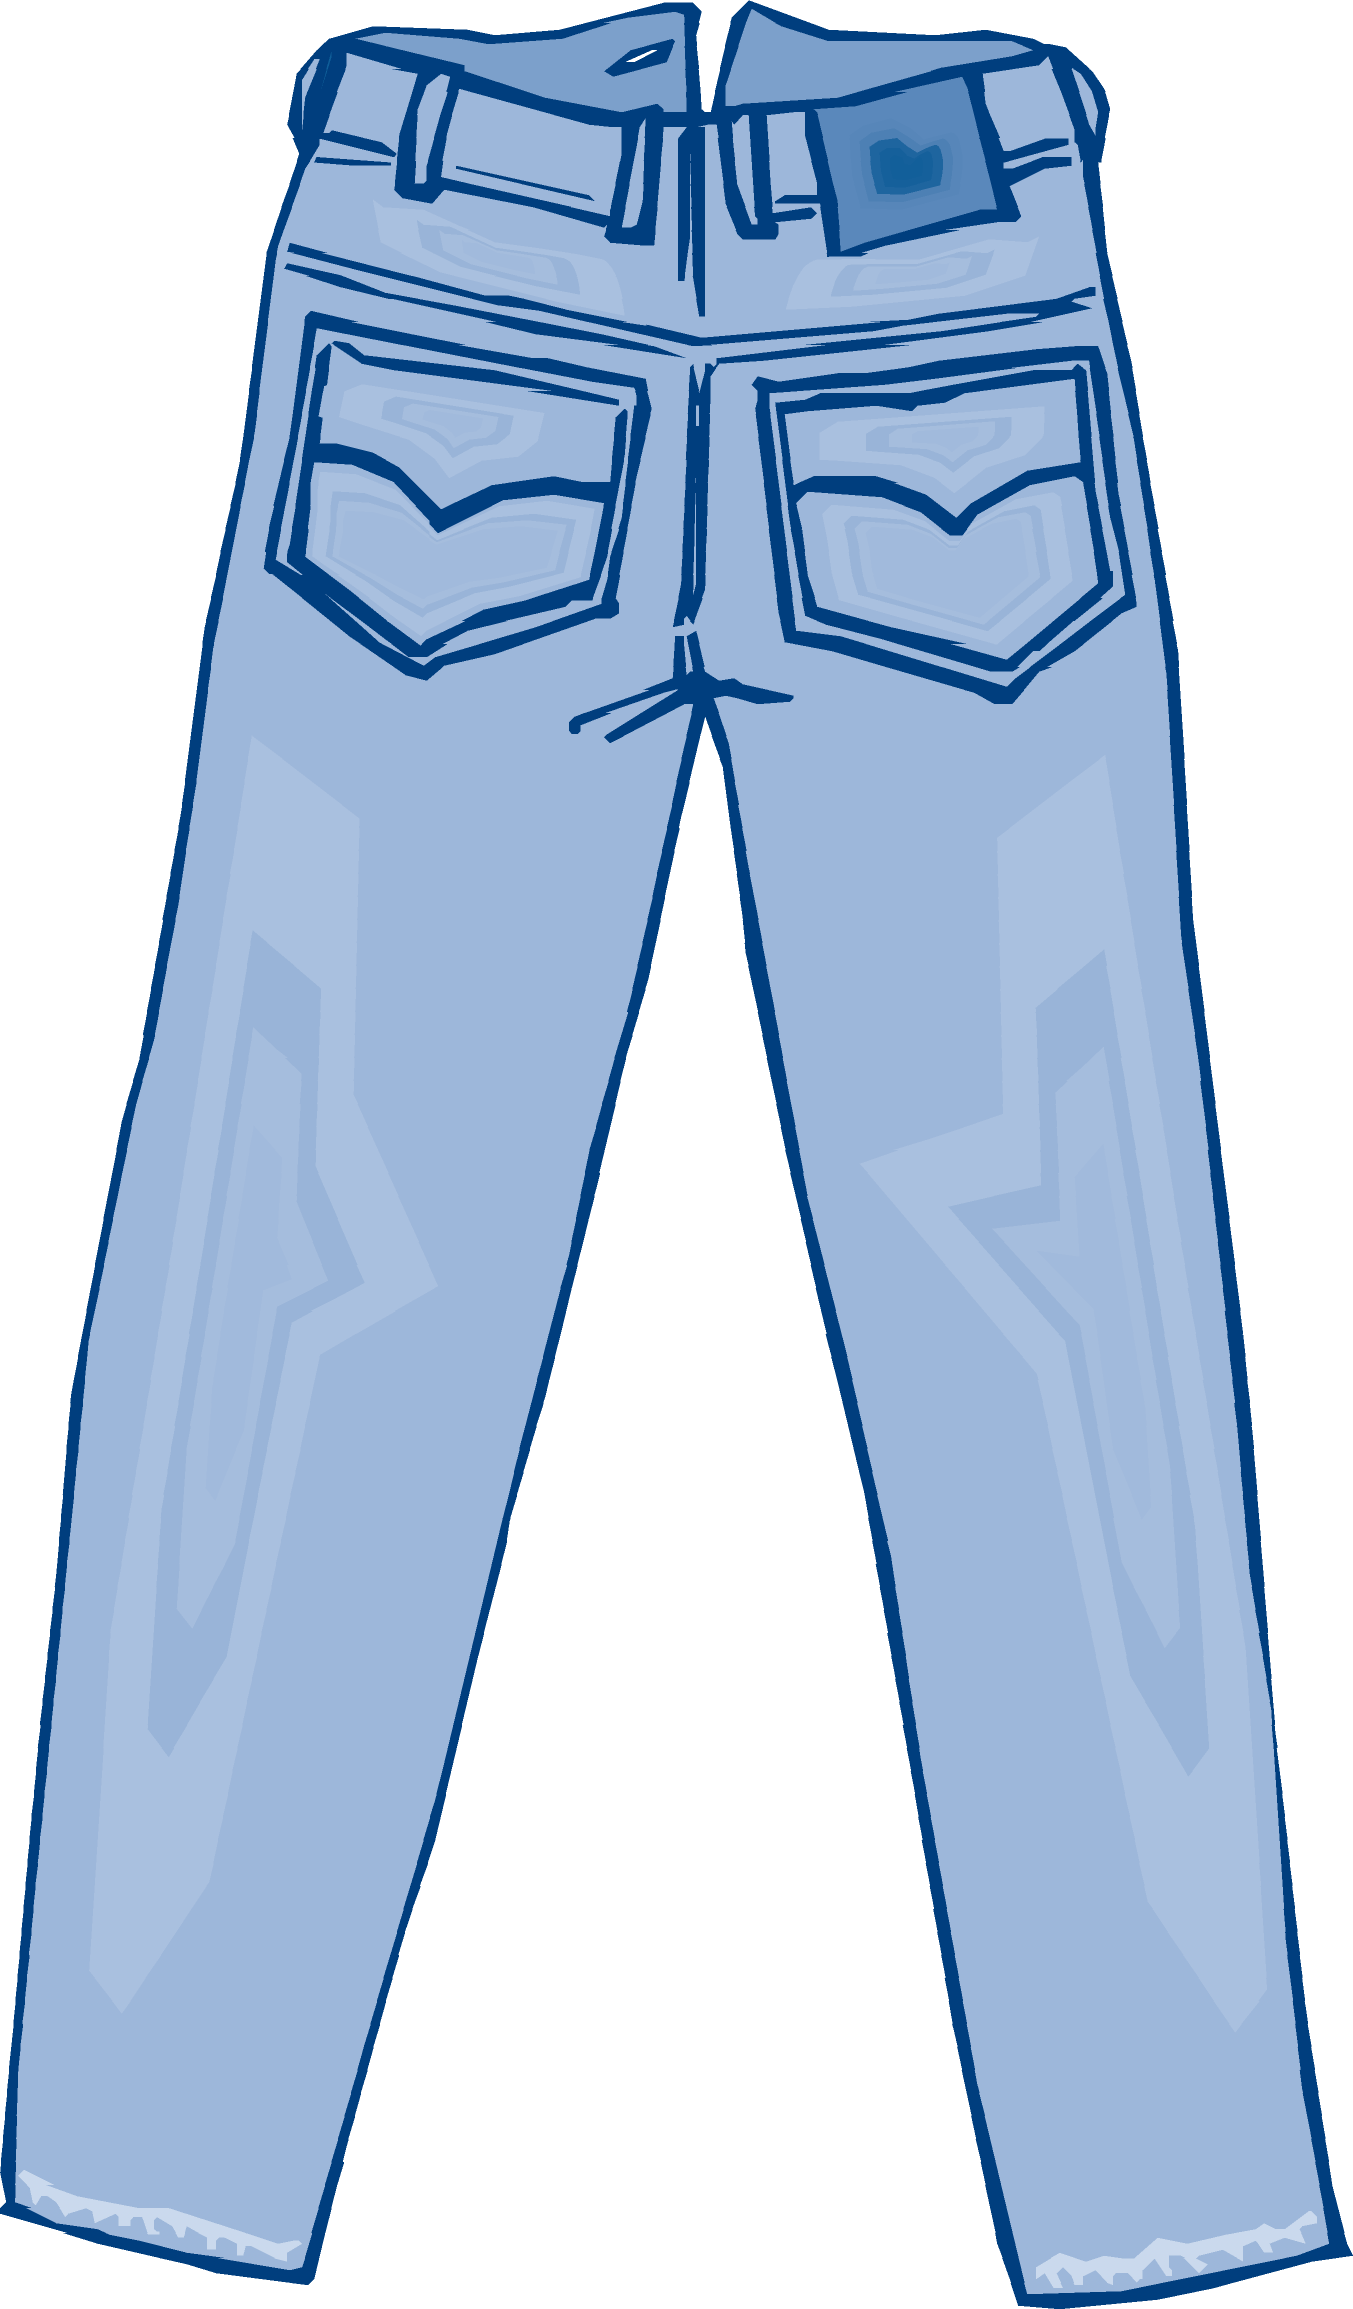 Jeans clipart Denim Vector  Clipart art